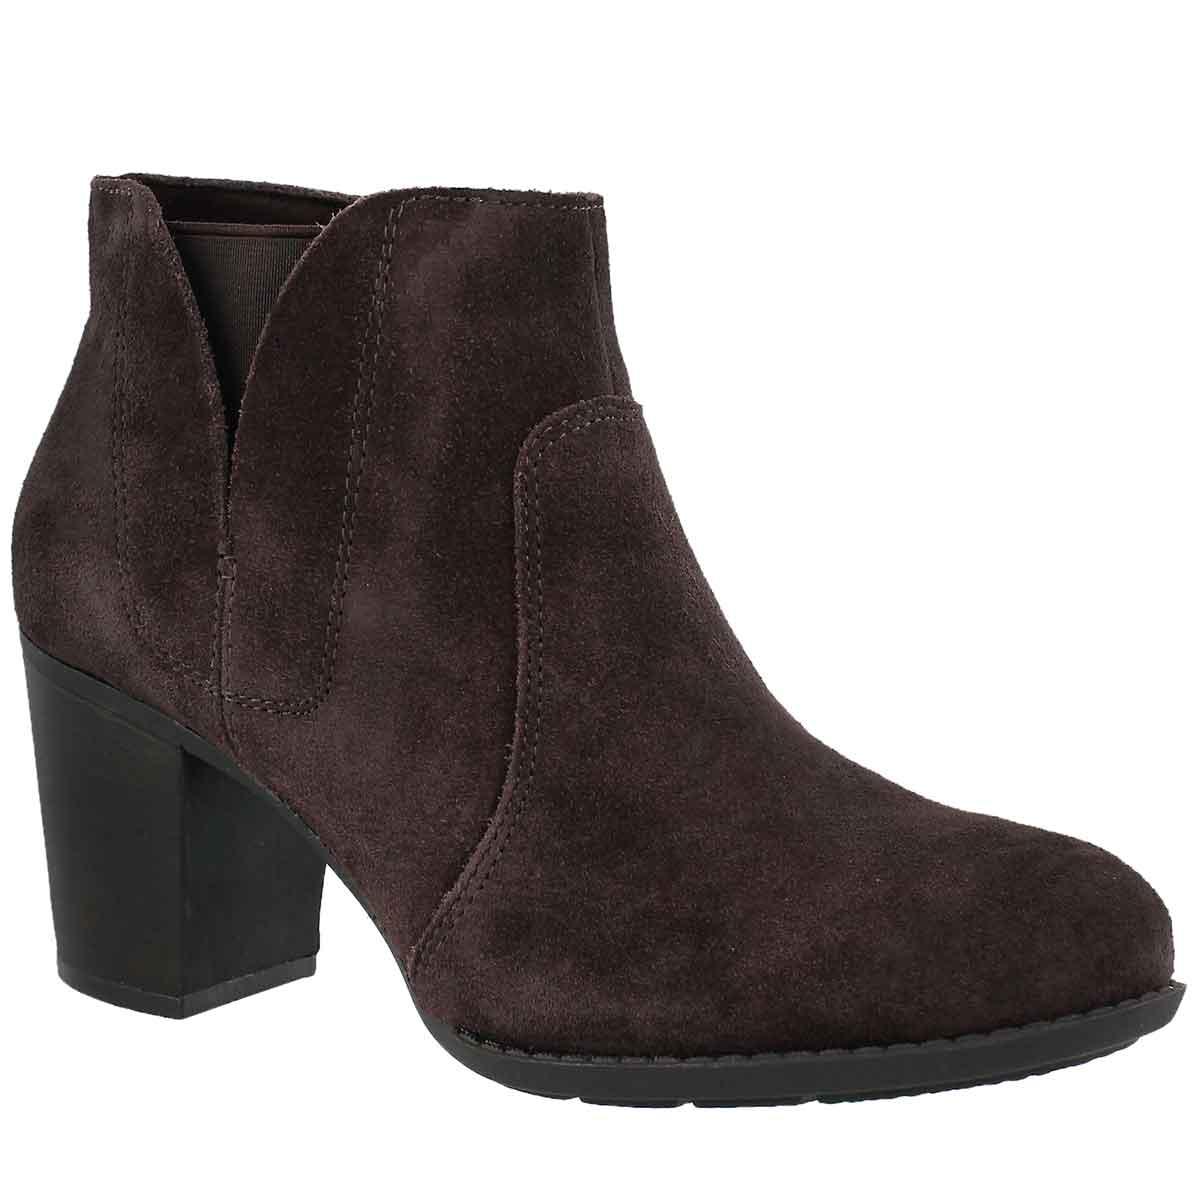 Women's ENFIELD SENYA dark brown dress booties